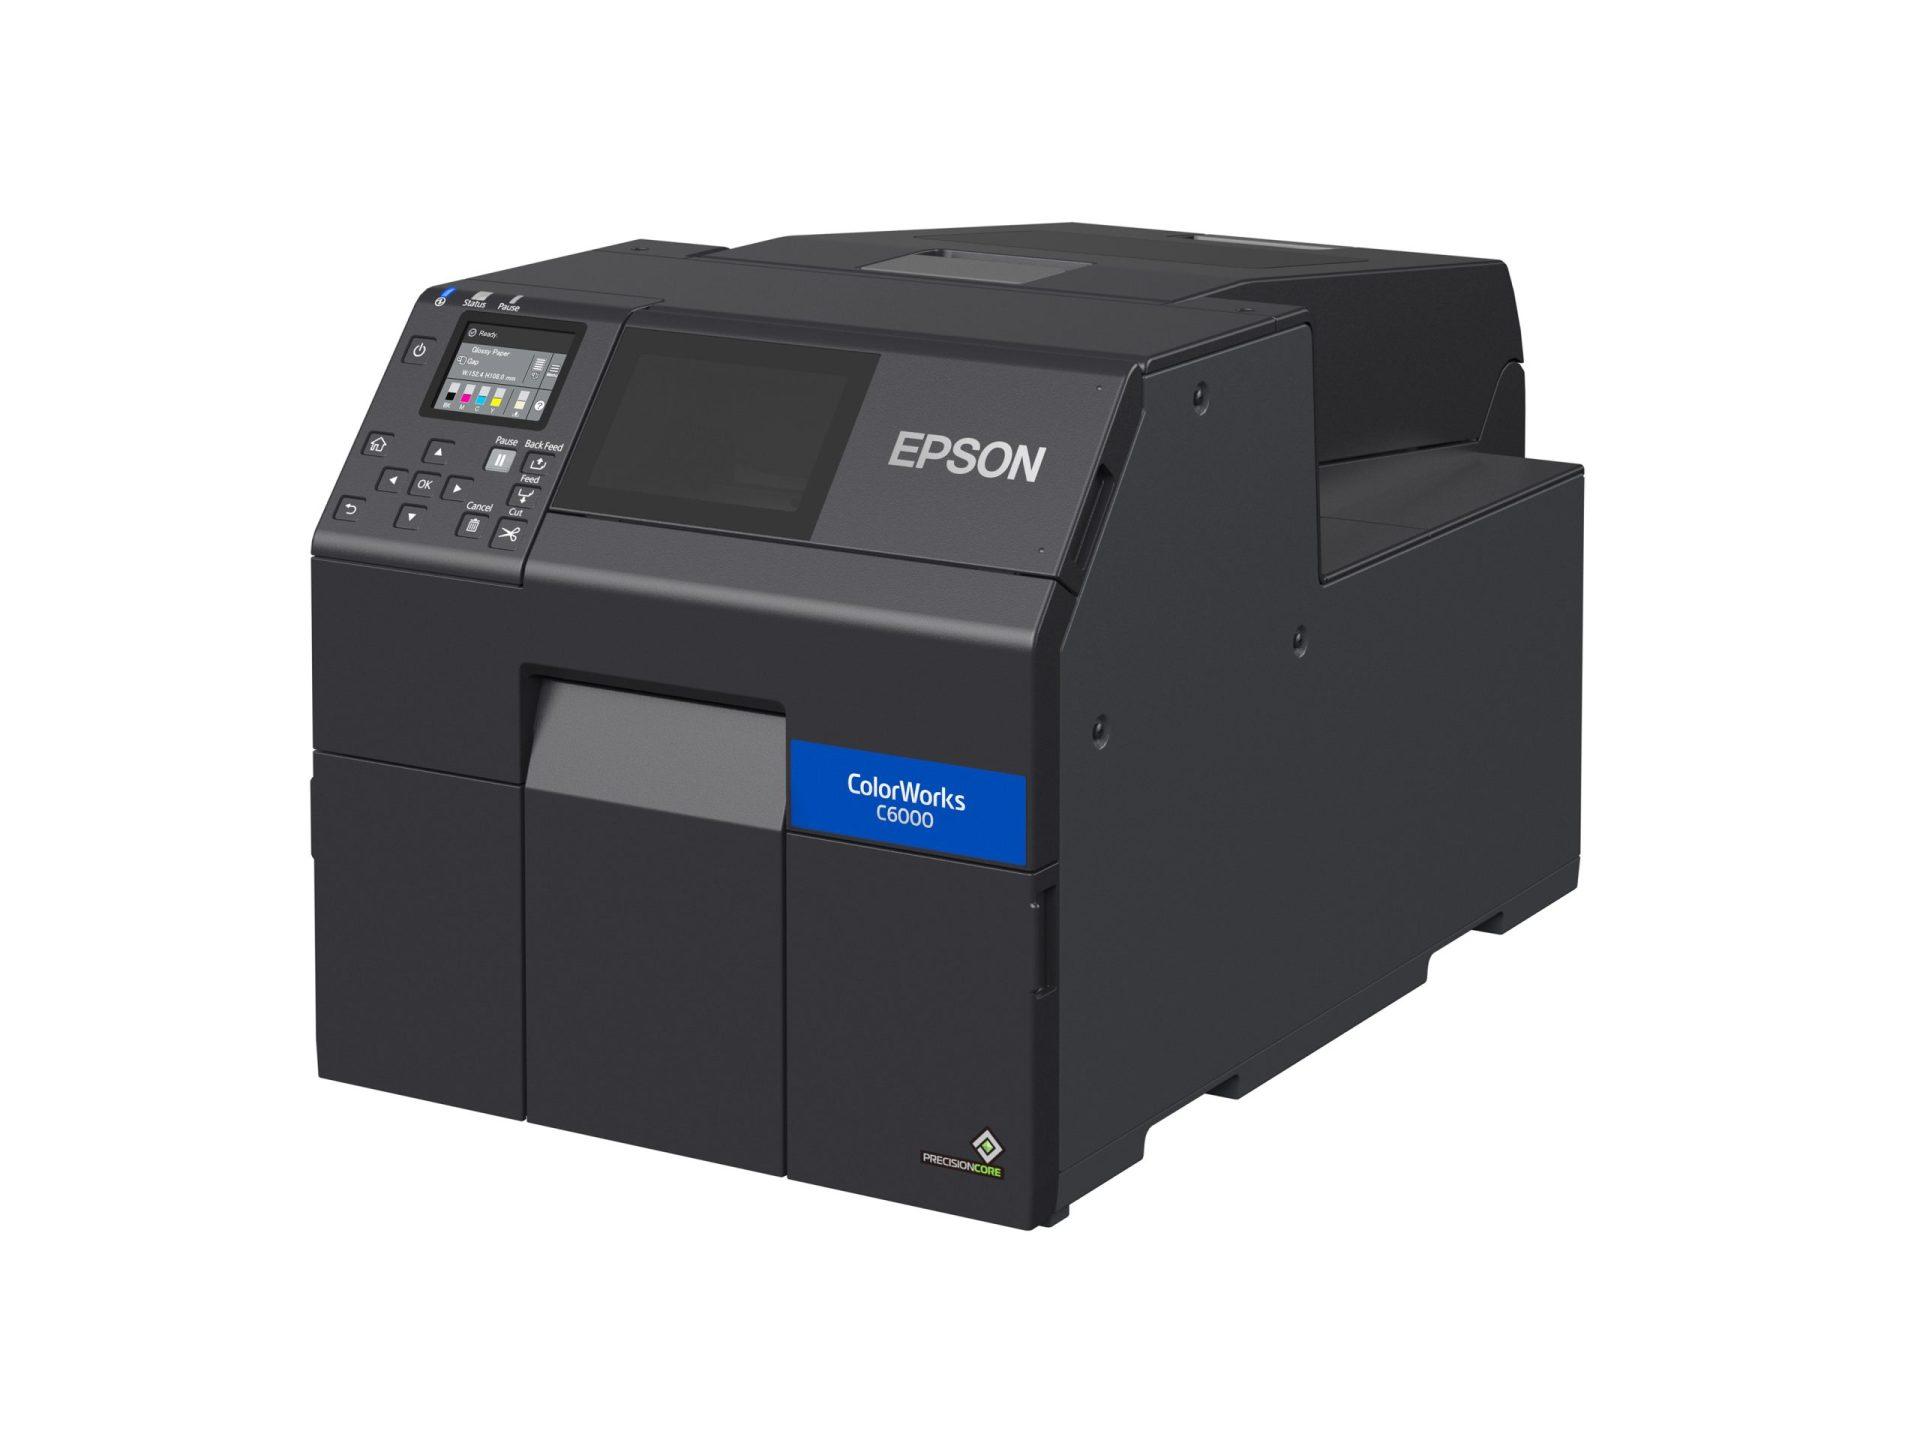 Epson_ColorWorks_CW-6000A